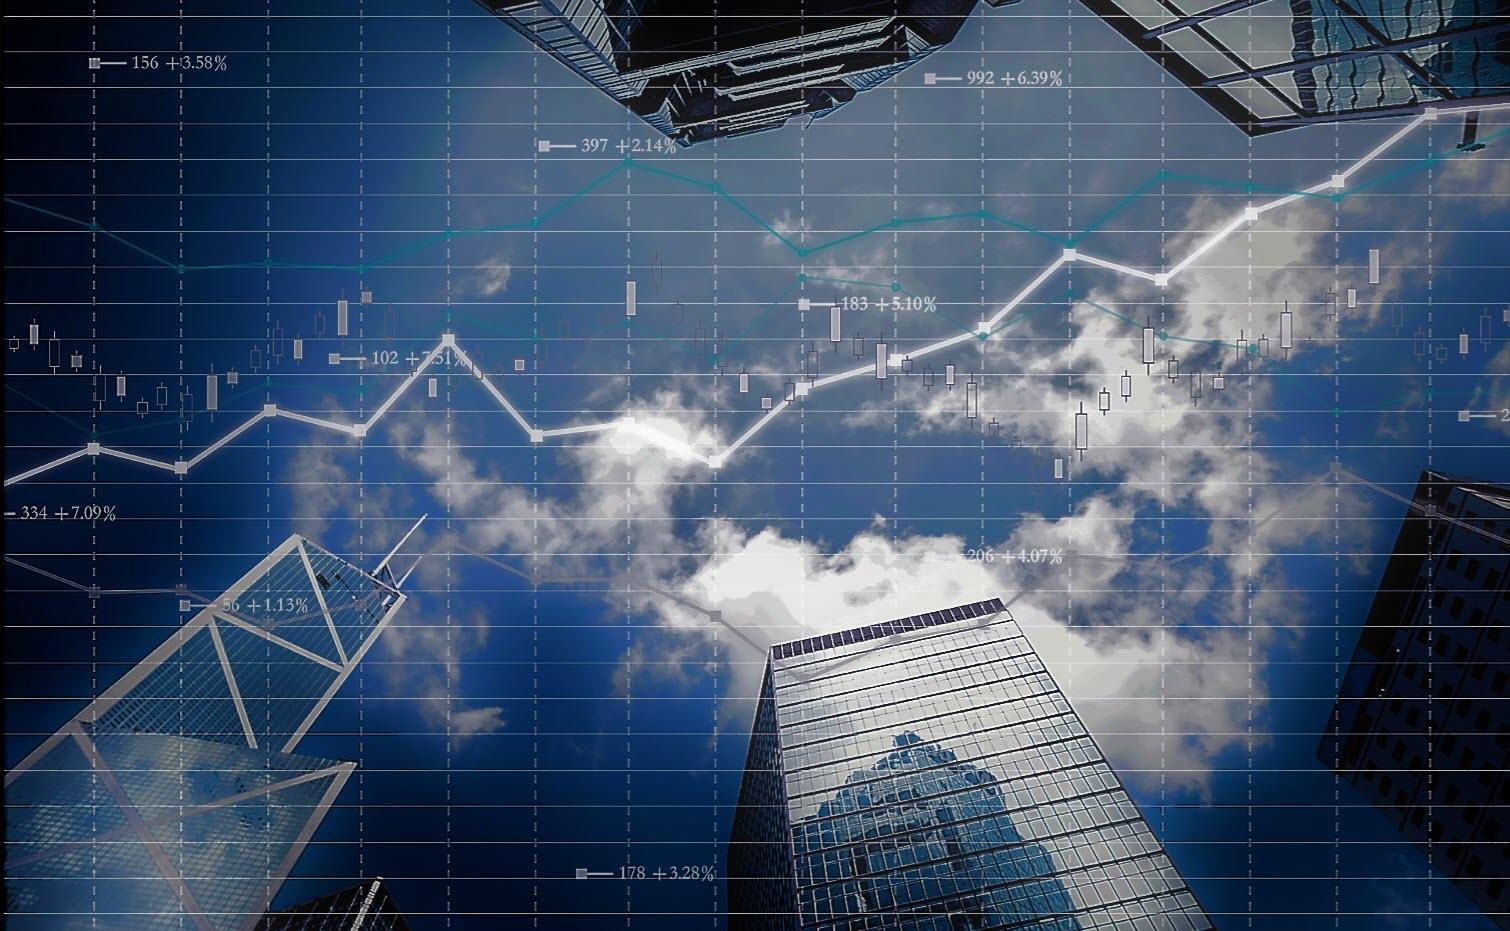 Затраты на облачные инфраструктуры за год выросли на 12,5%